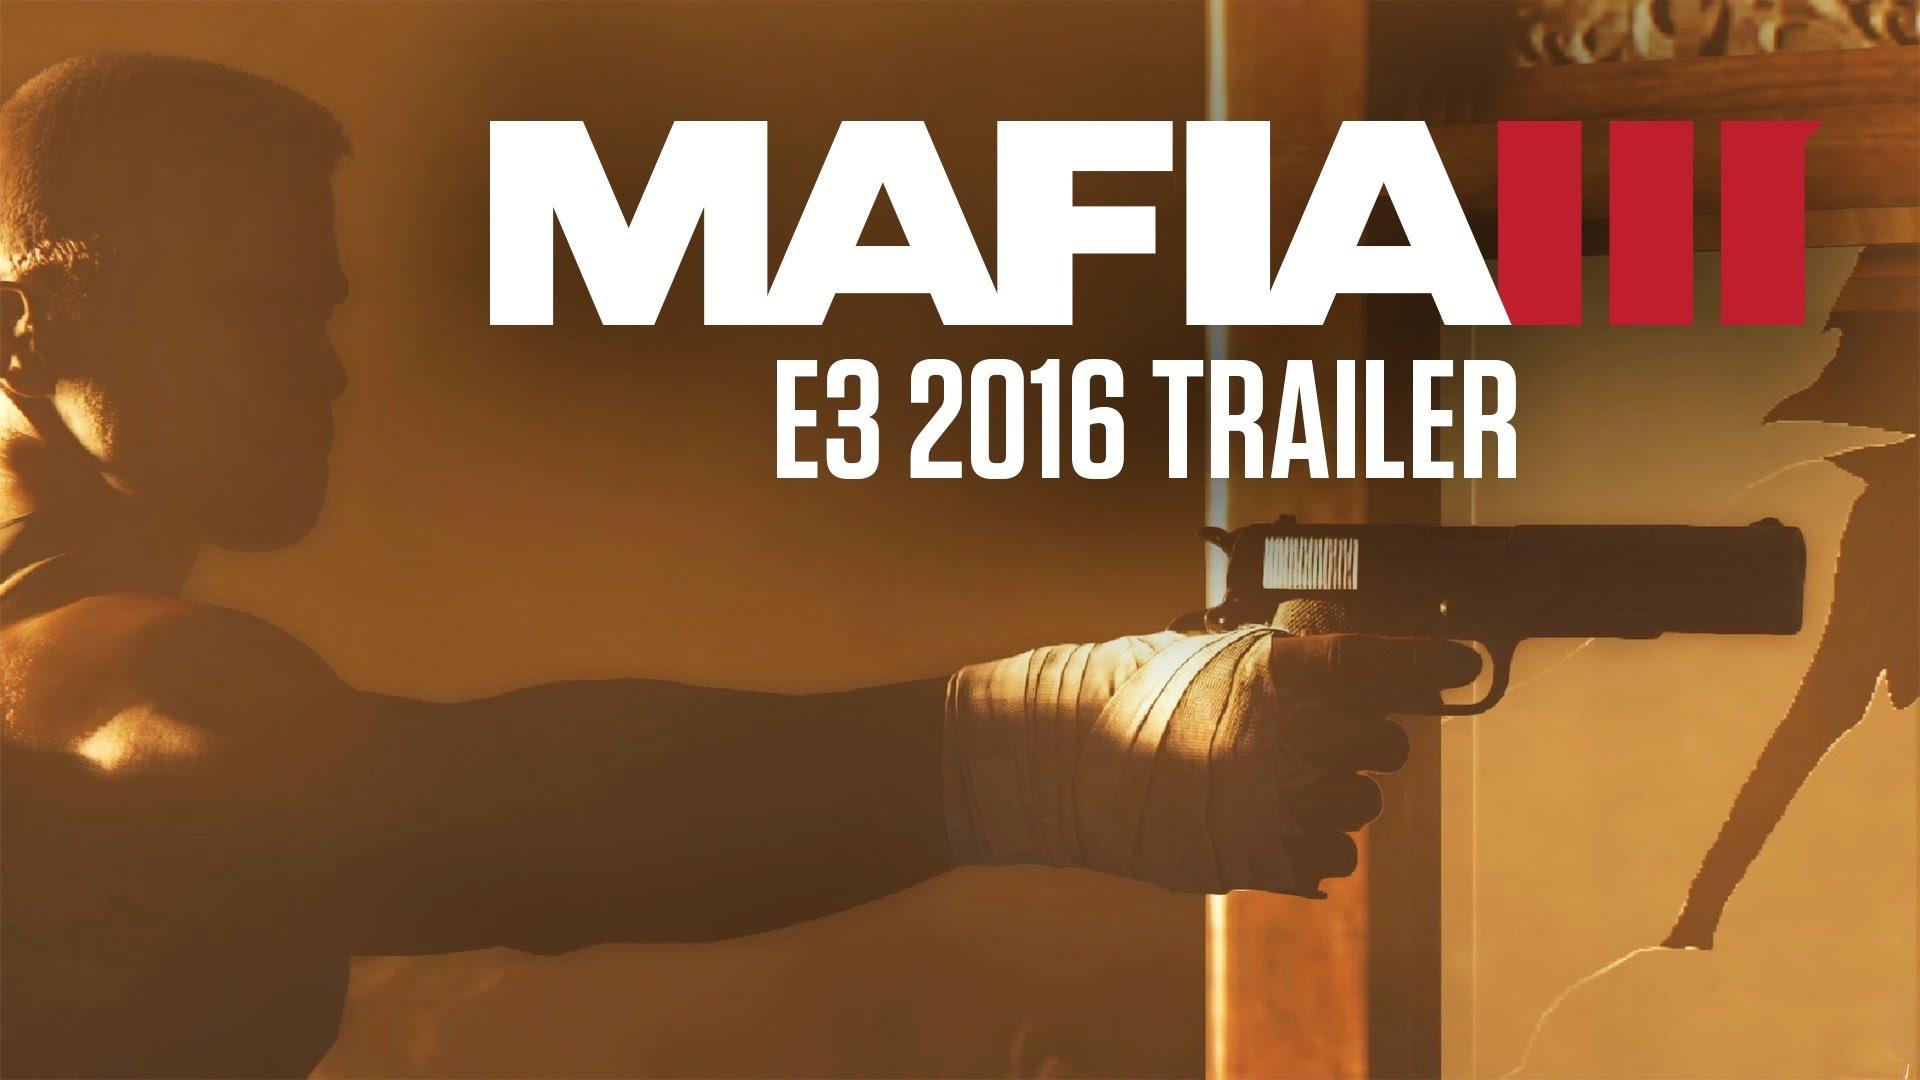 Mafia III prezent la E3 2016 cu un nou trailer